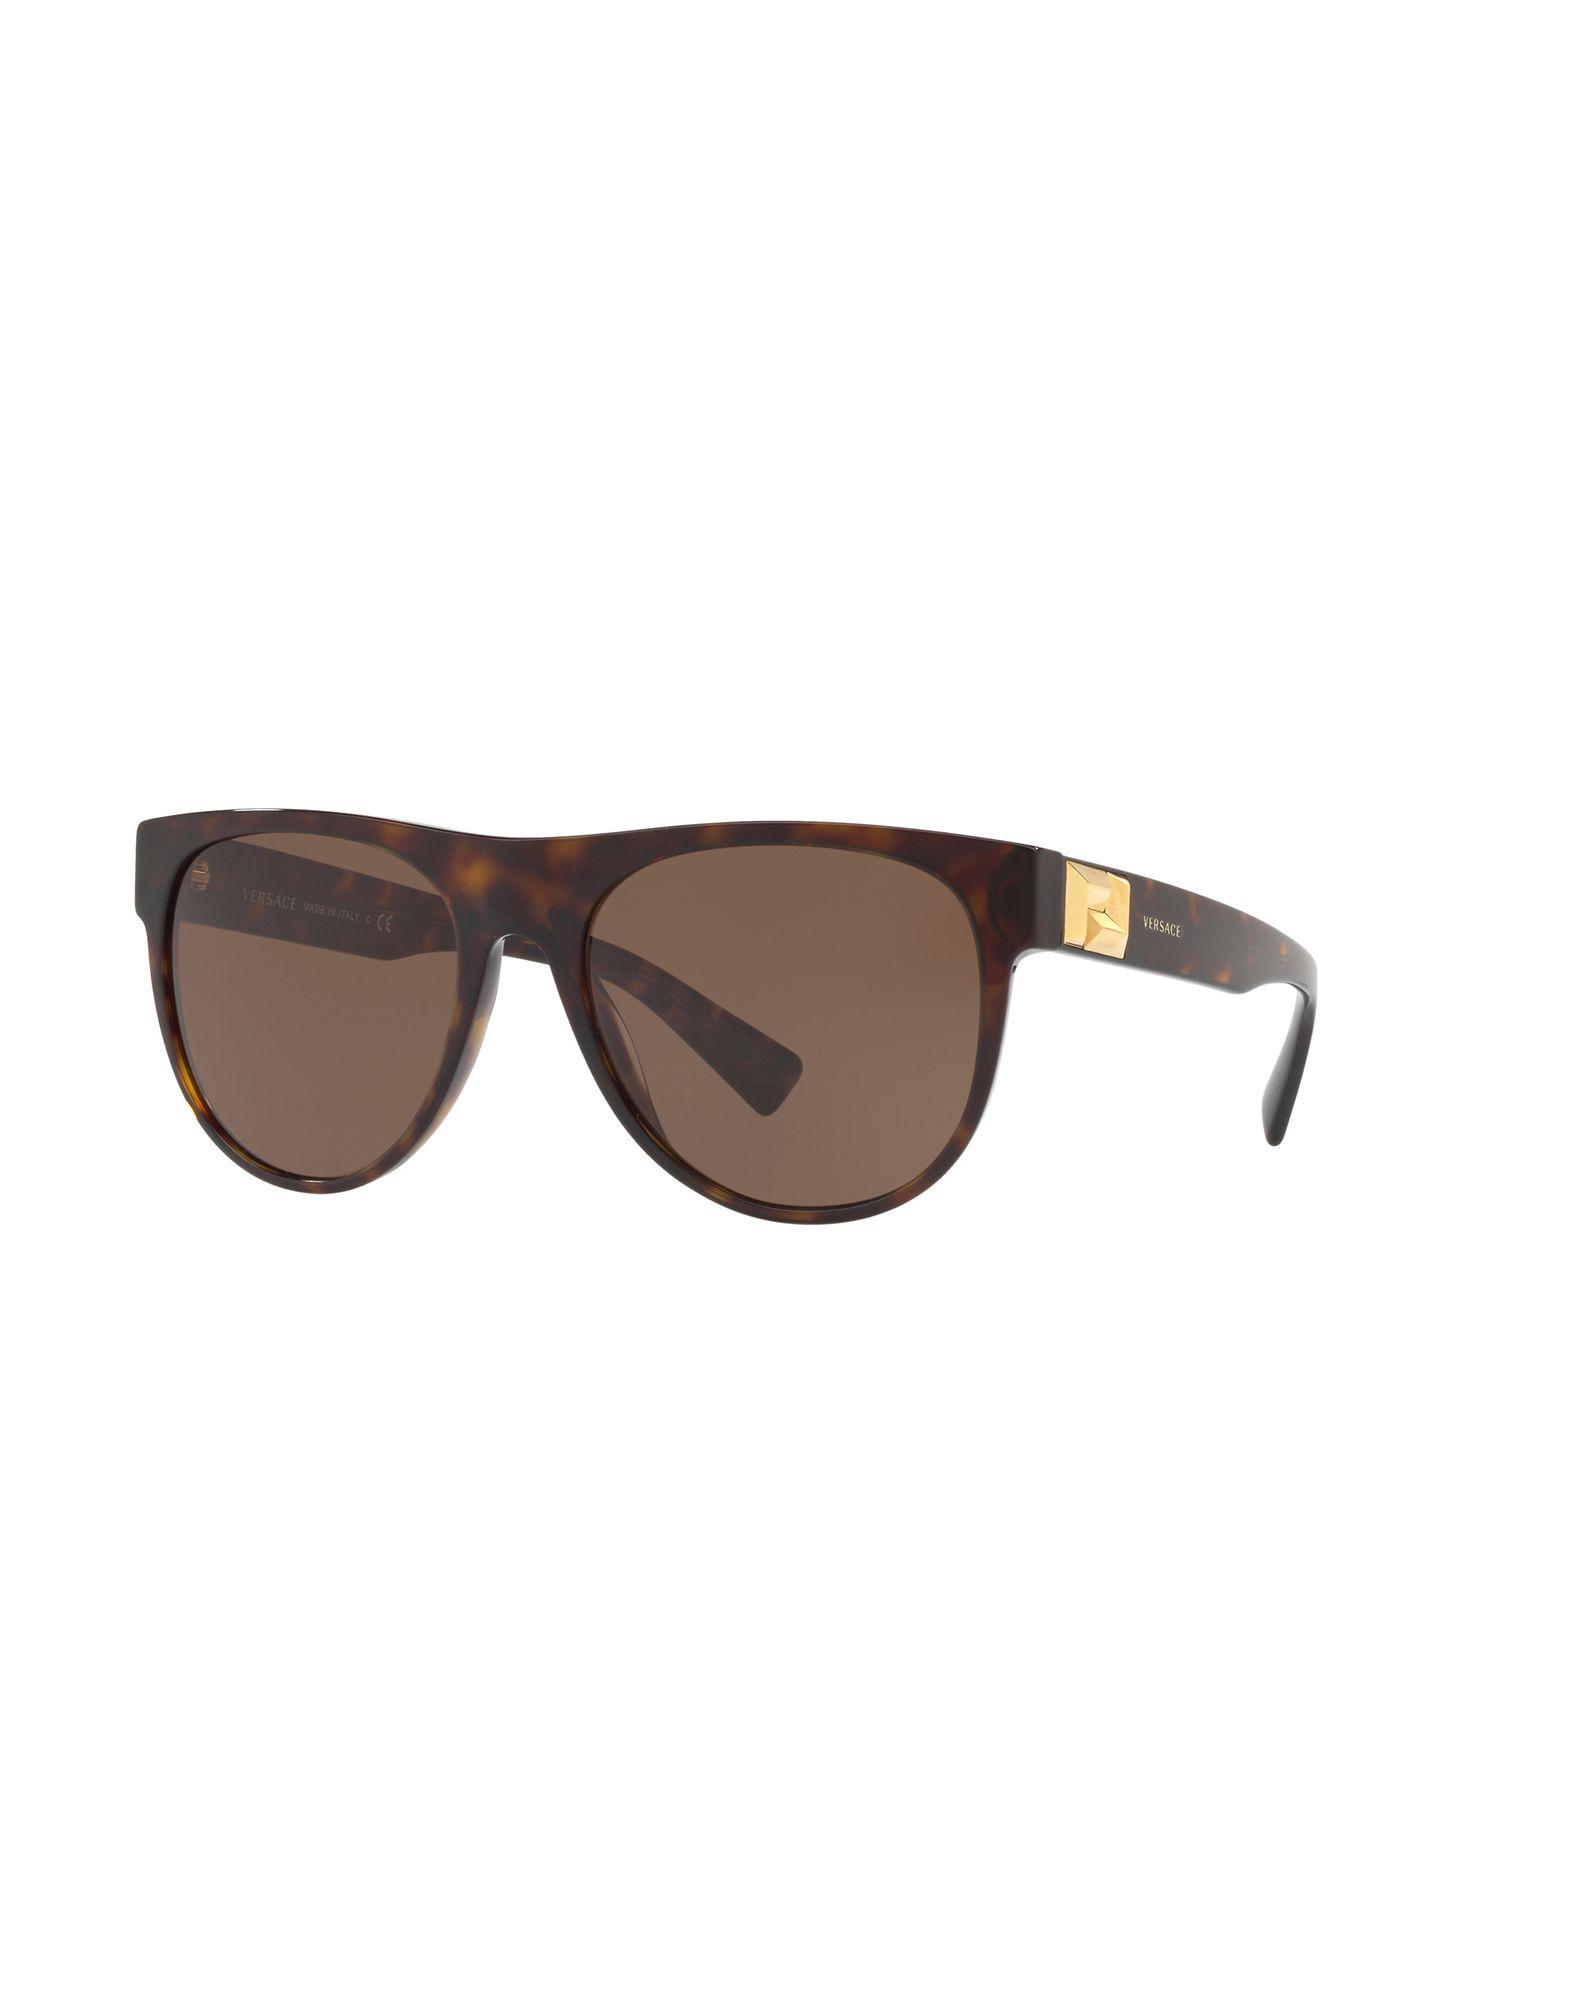 Occhiali Da Sole Versace Ve4346 - Uomo - Acquista online su